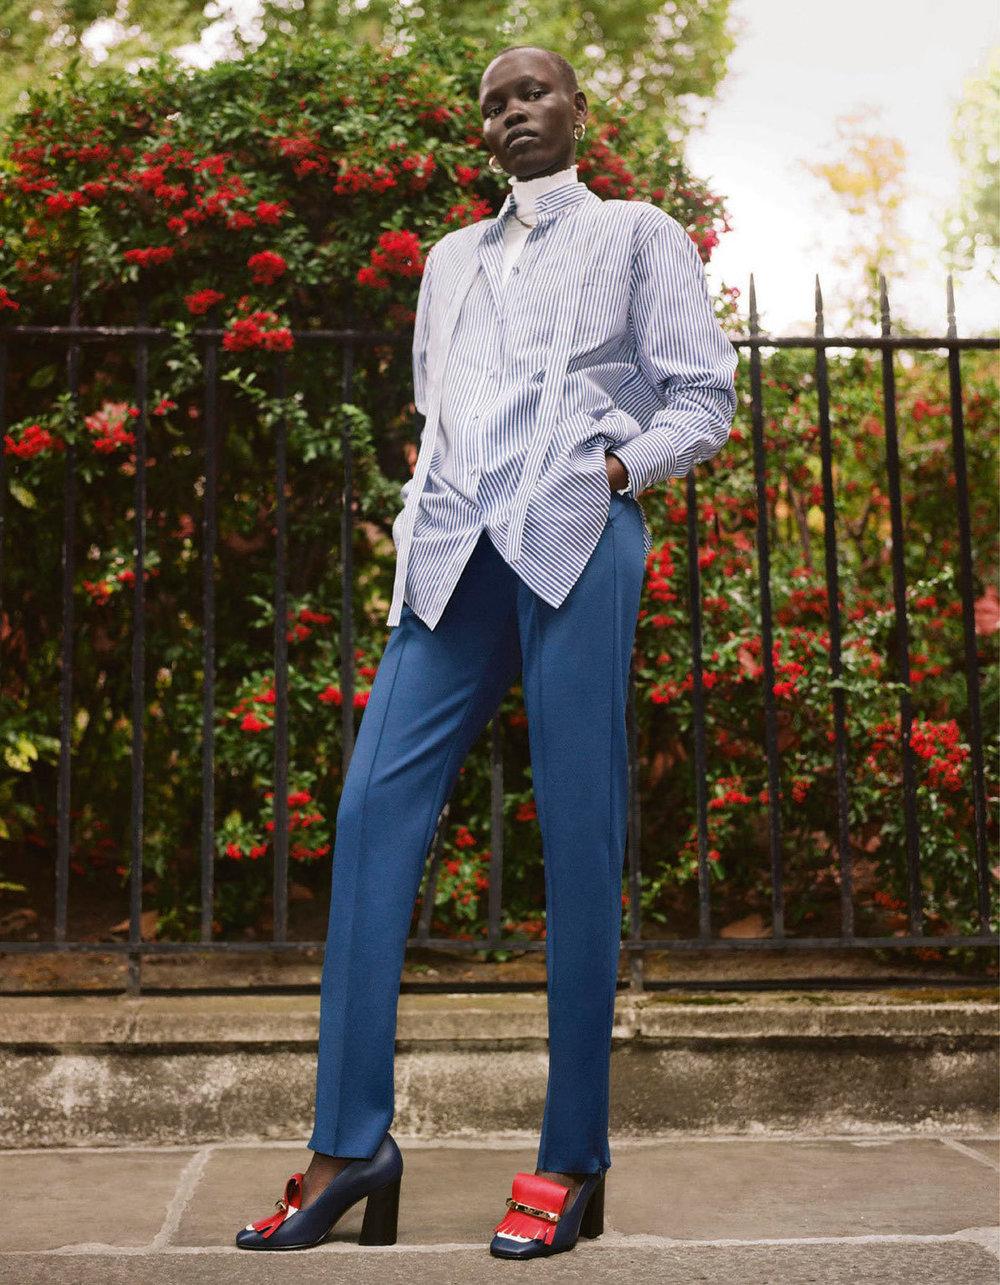 Grace Bol by Mehdi Lacoste for Porter Magazine 30 (5).jpg